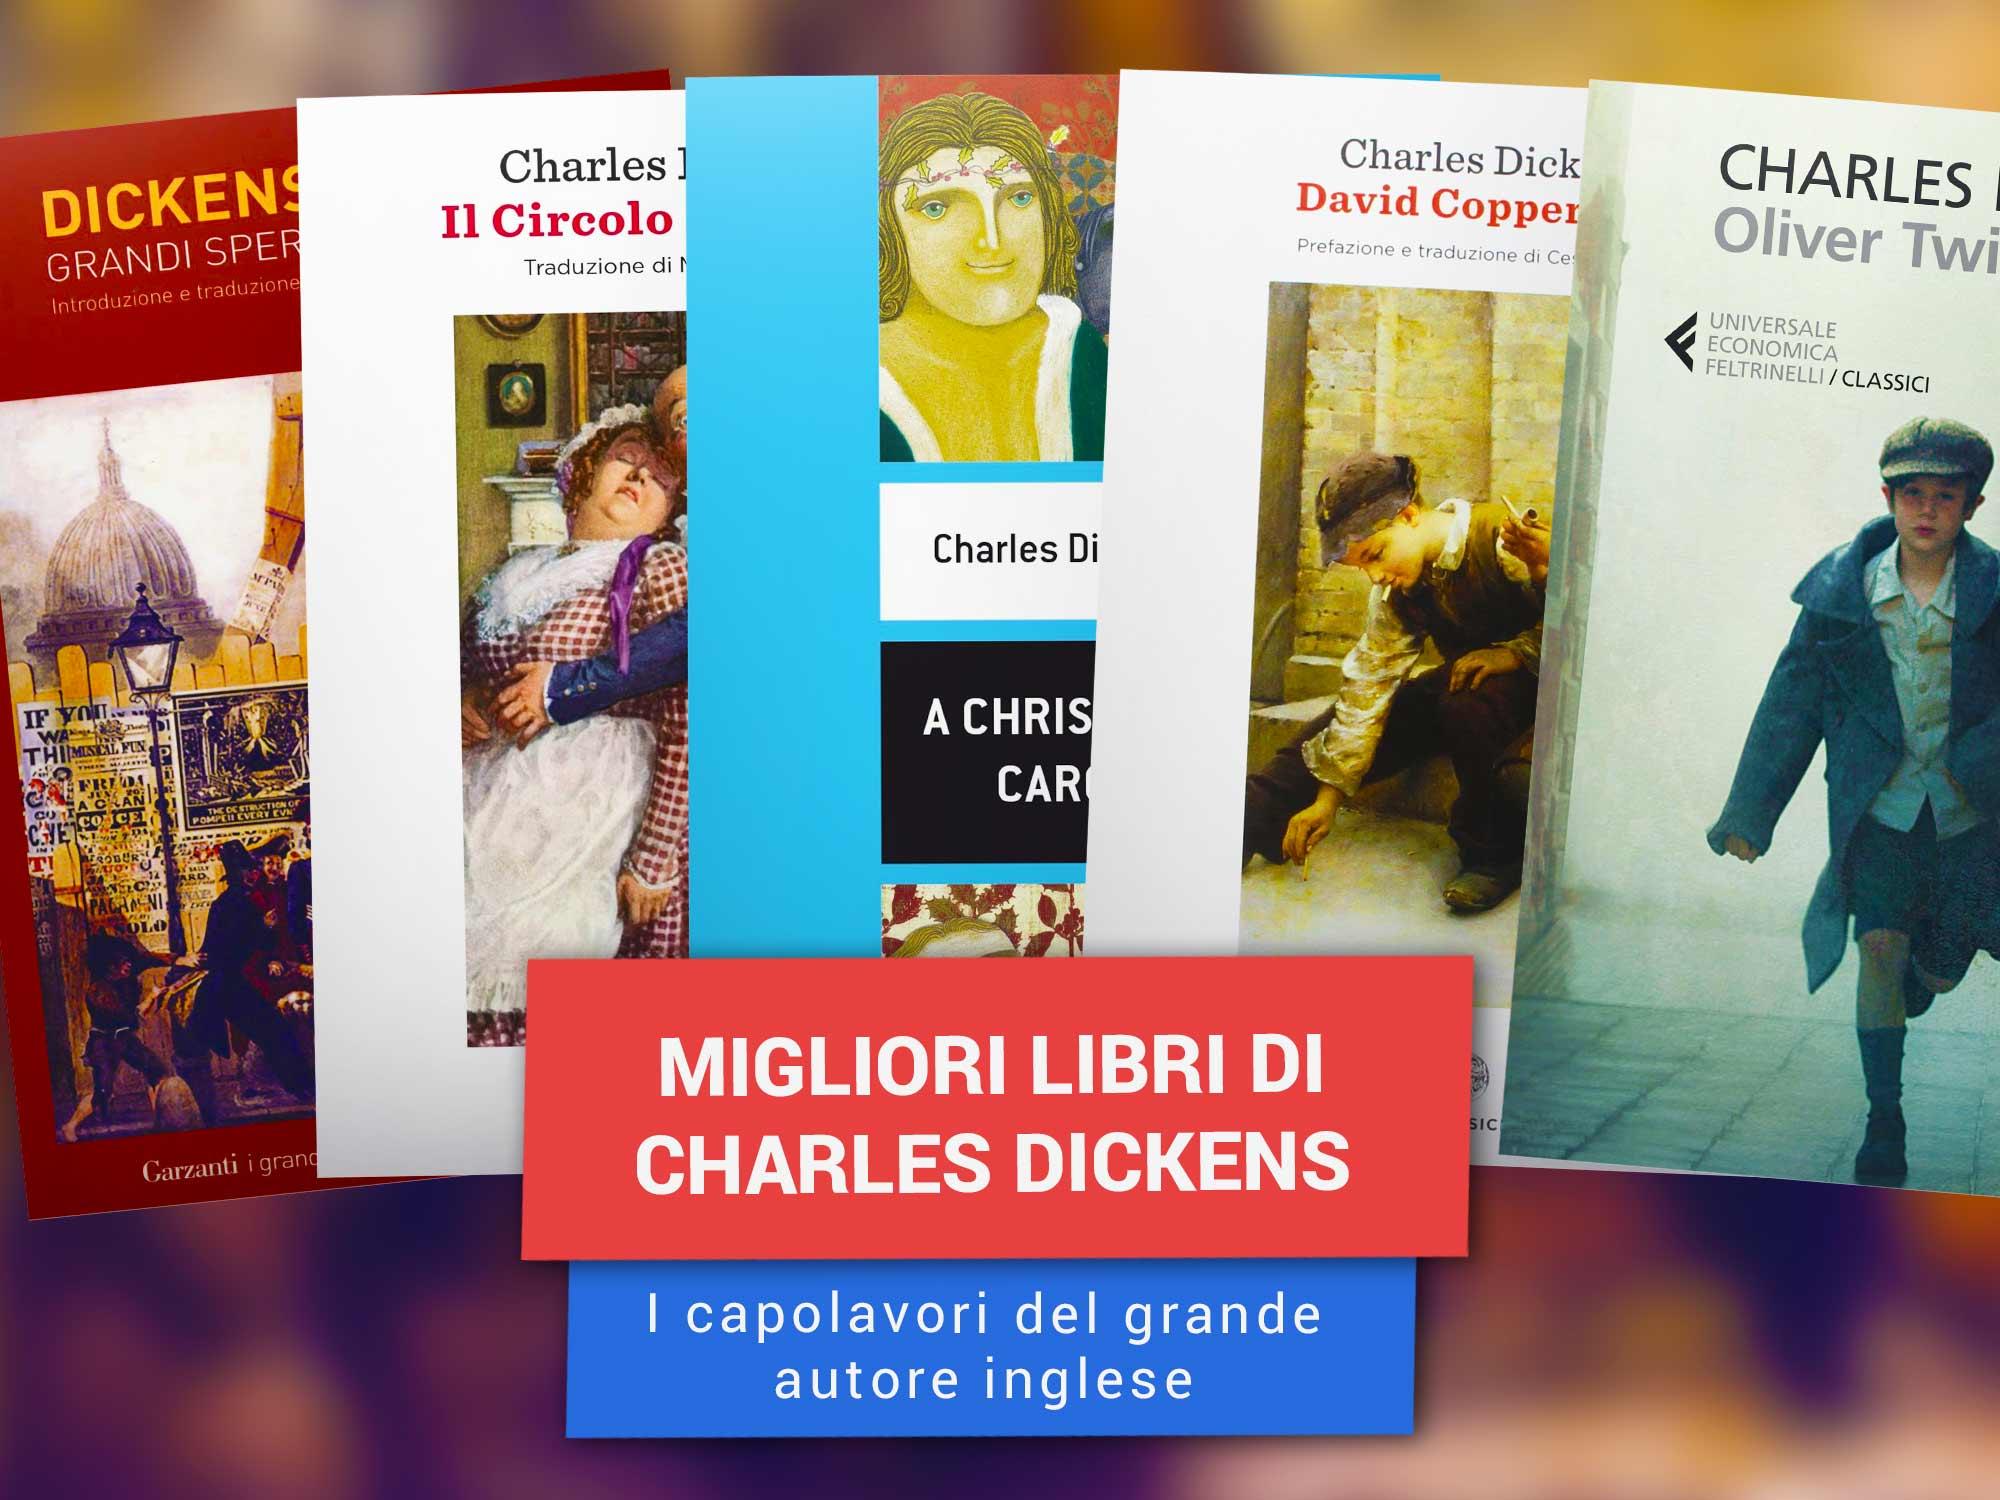 Charles Dickens Libri| Migliori Libri Di Charles Dickens